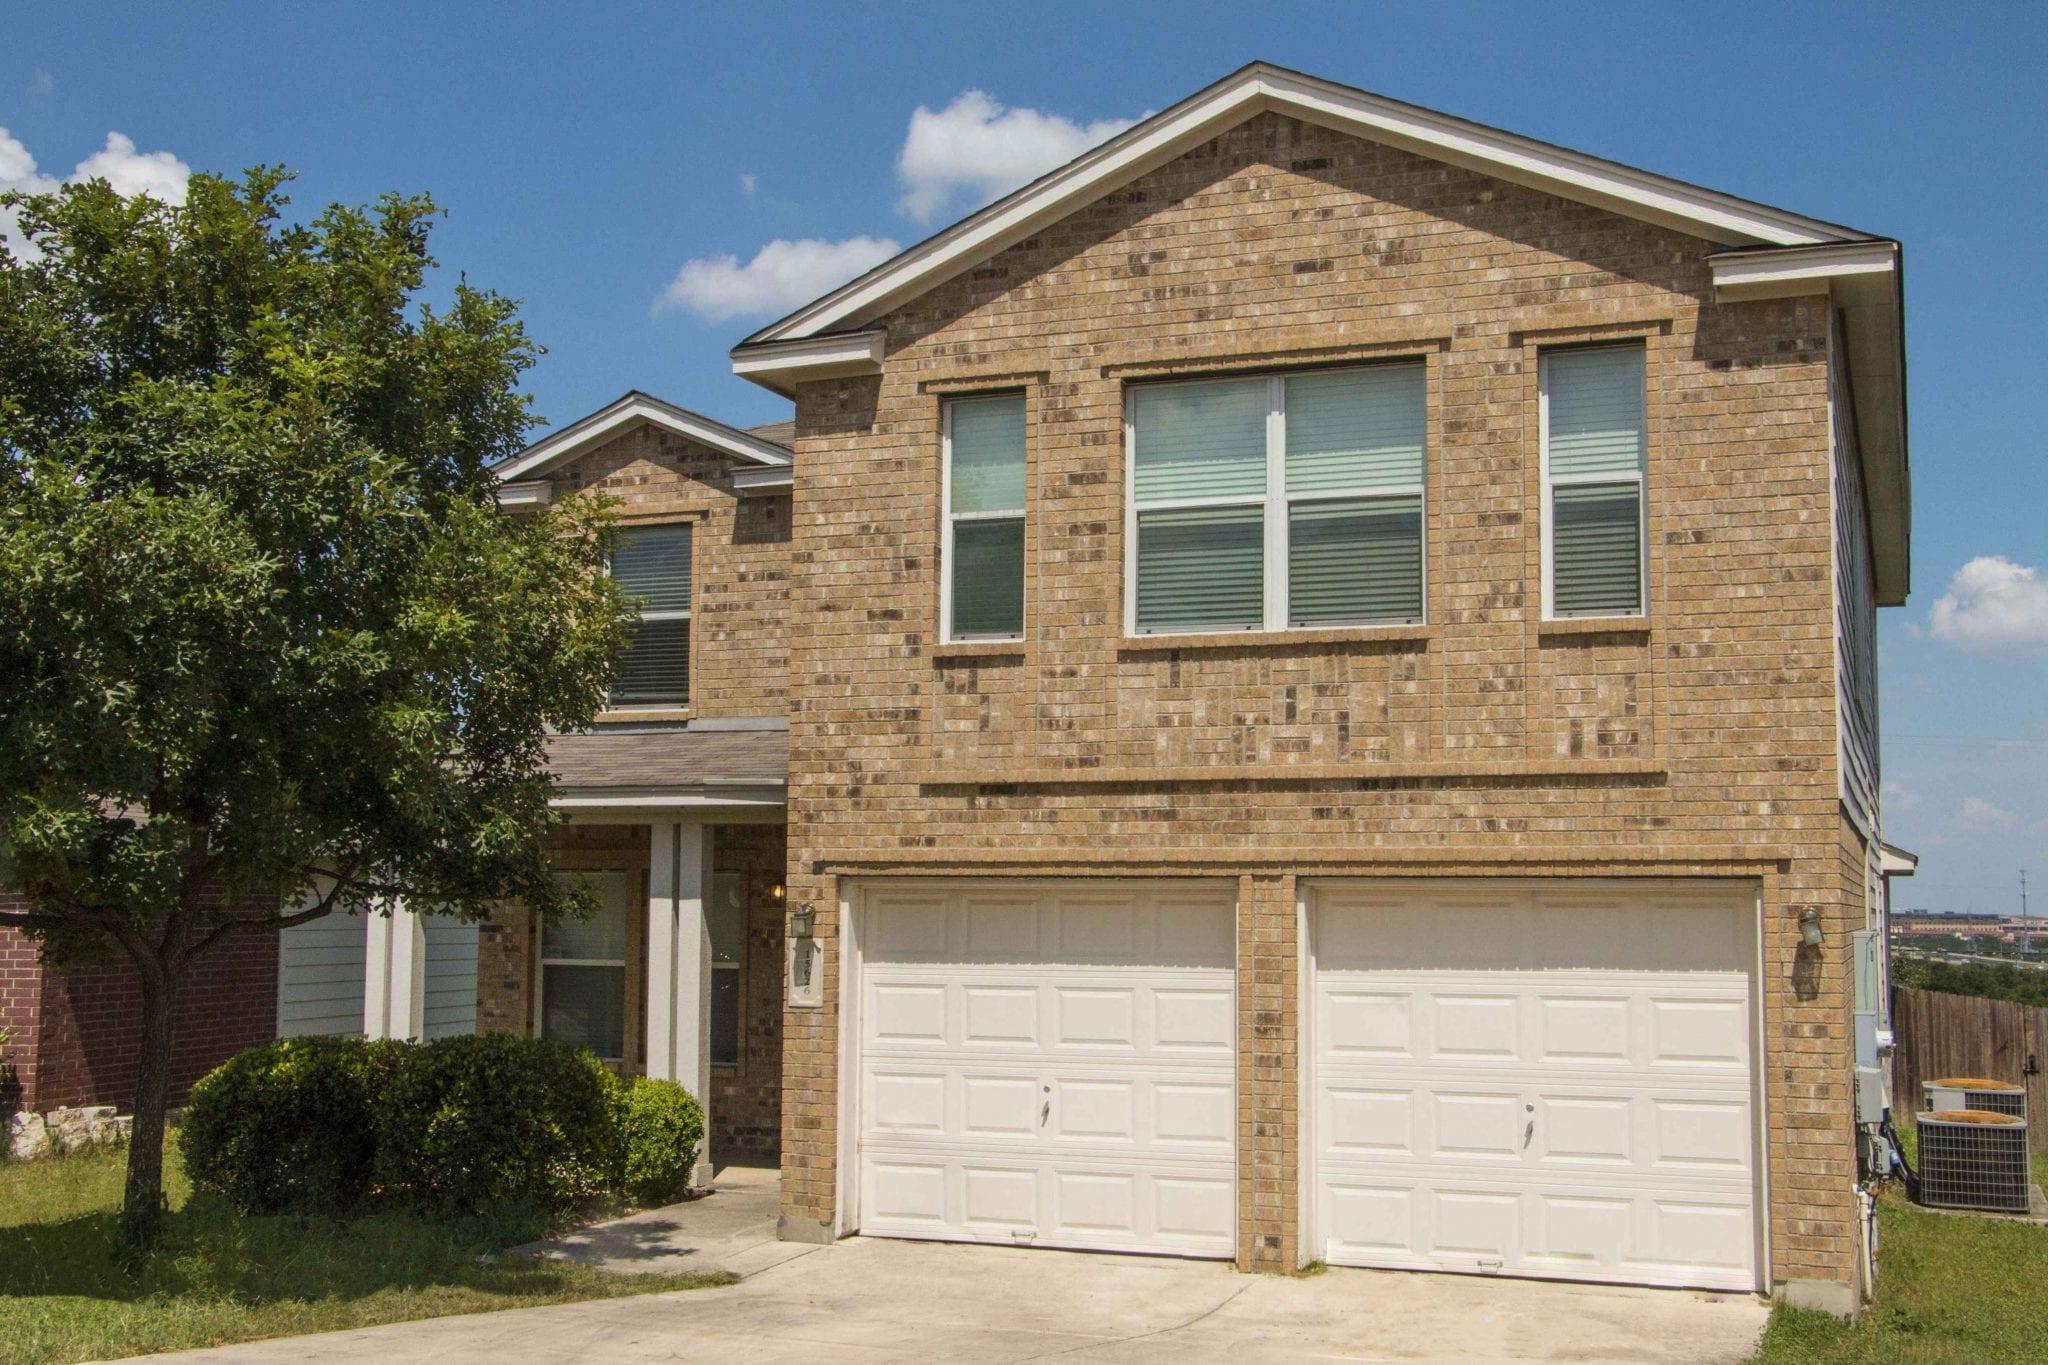 4 Bedroom Houses For Rent In San Antonio Texas Marbach Village New Home Community San Antonio